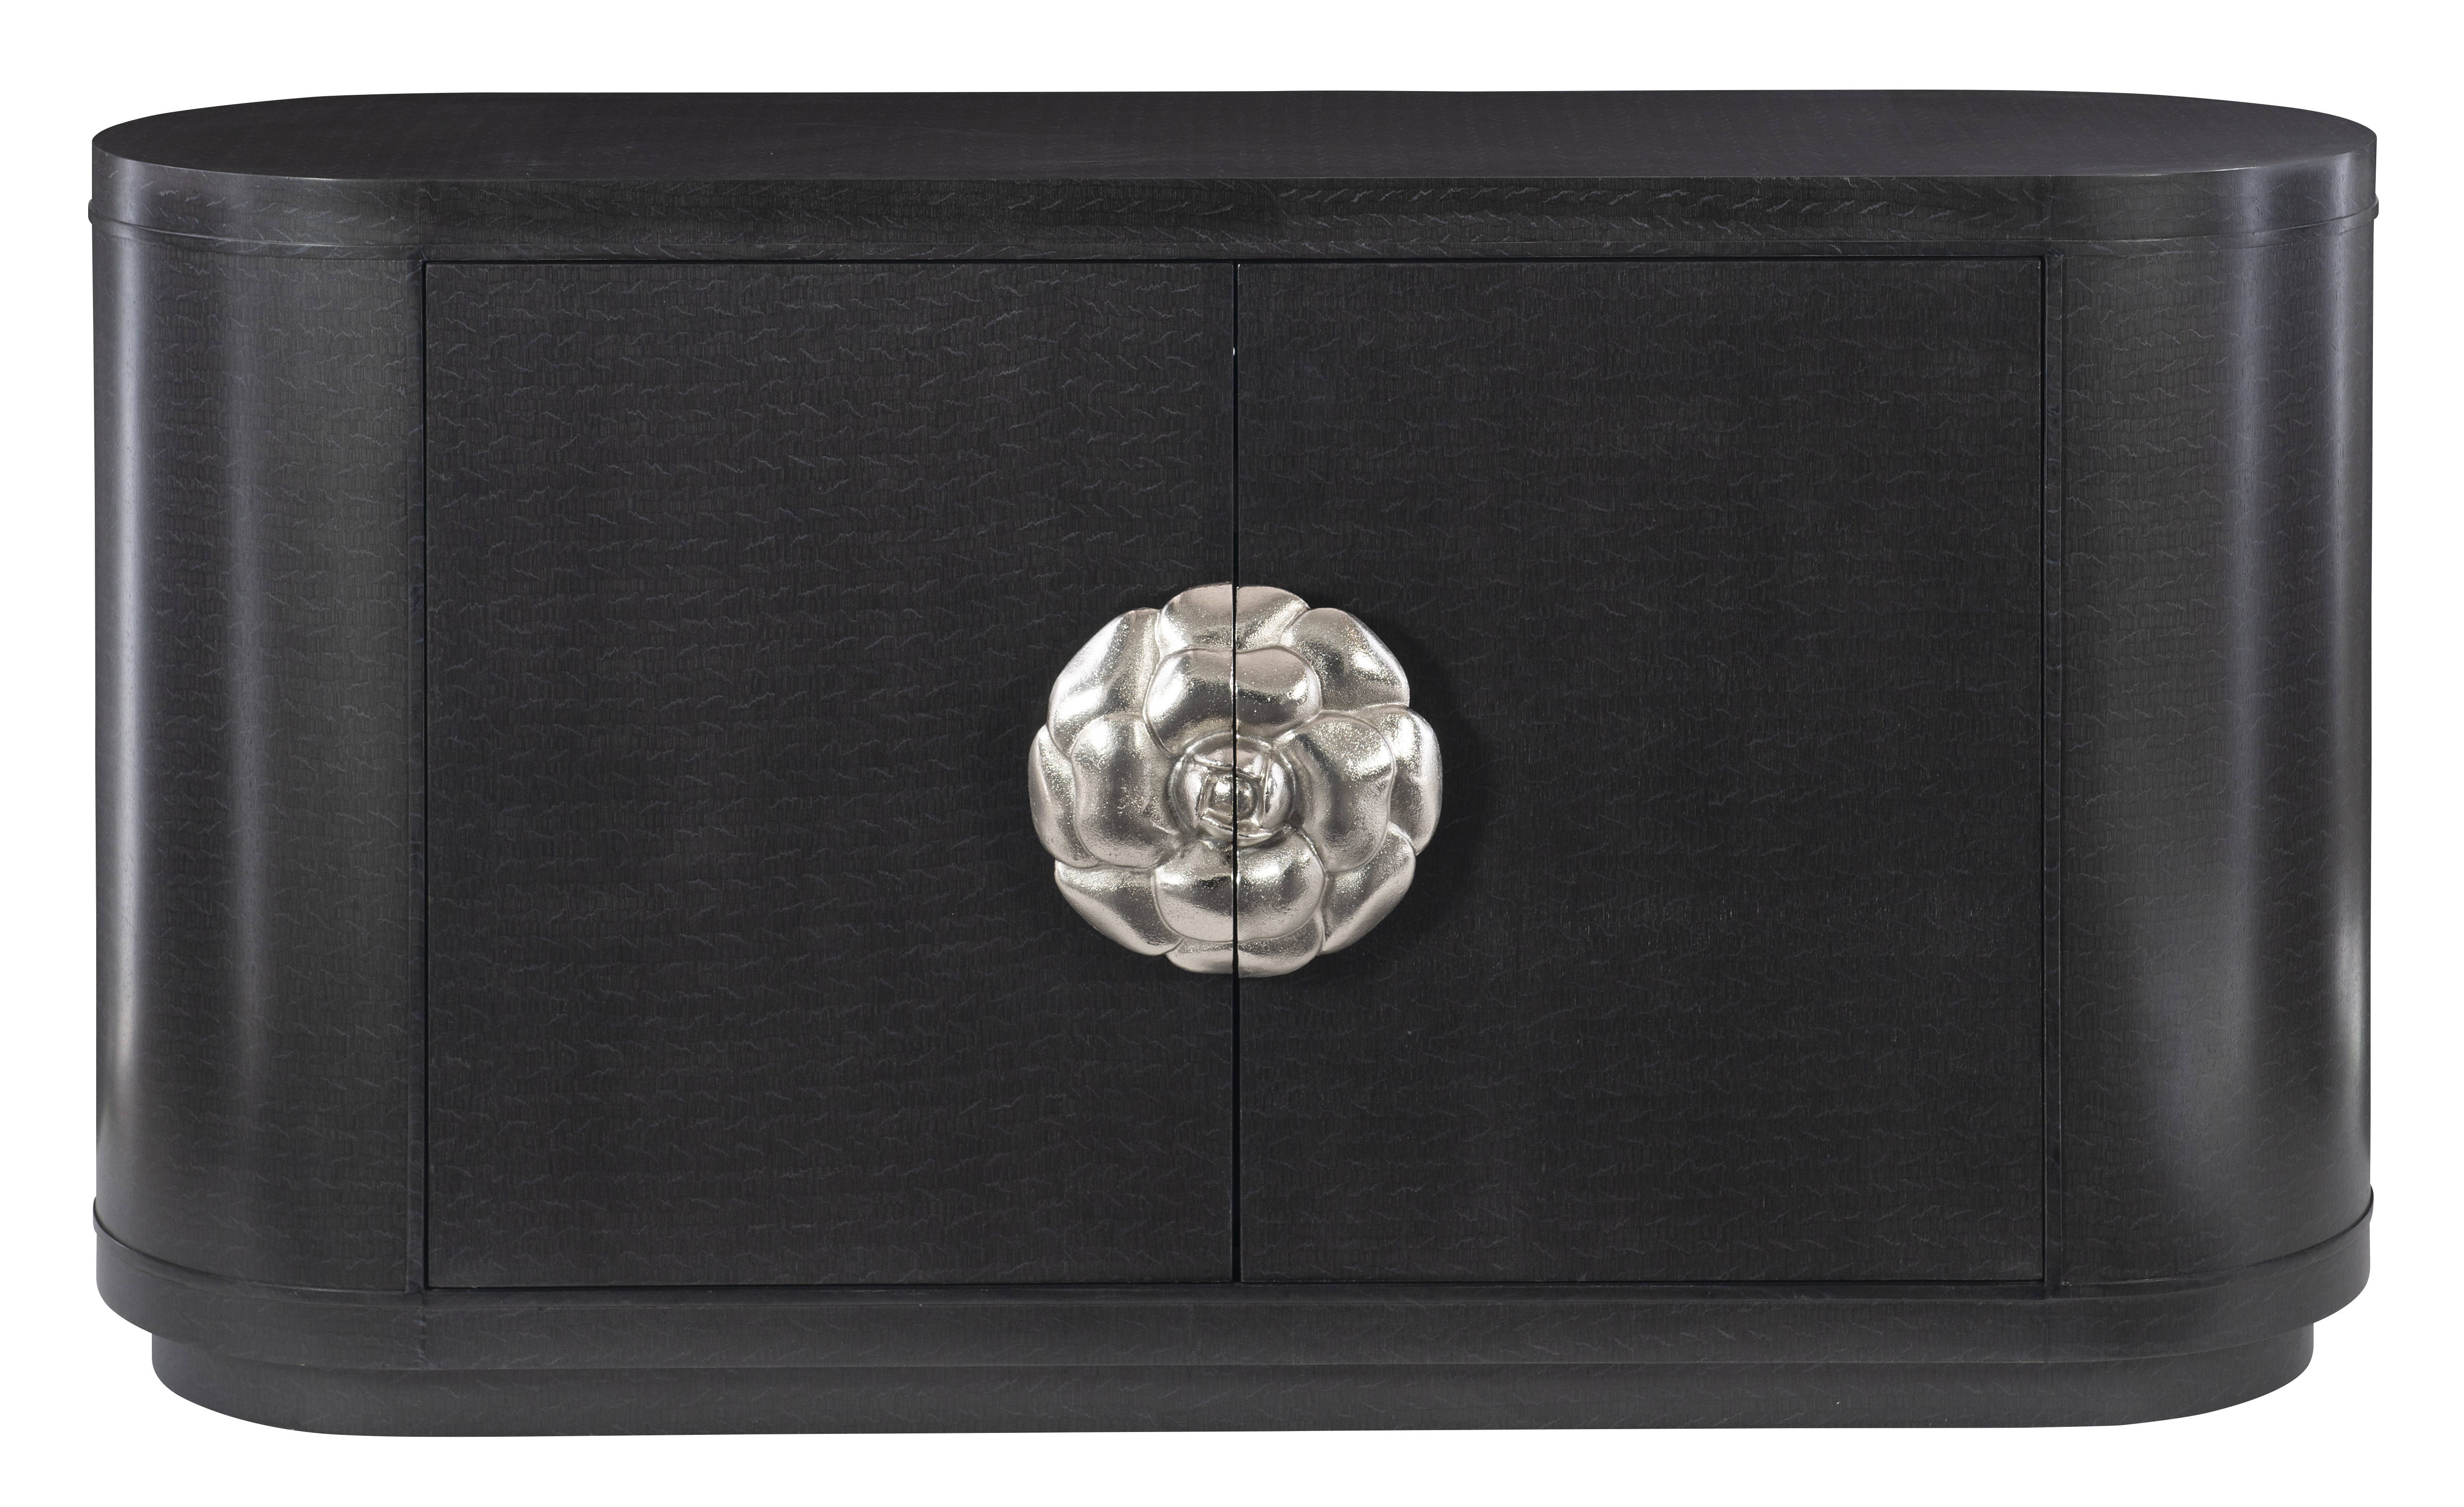 Silhouette Sideboards by Bernhardt at Belfort Furniture